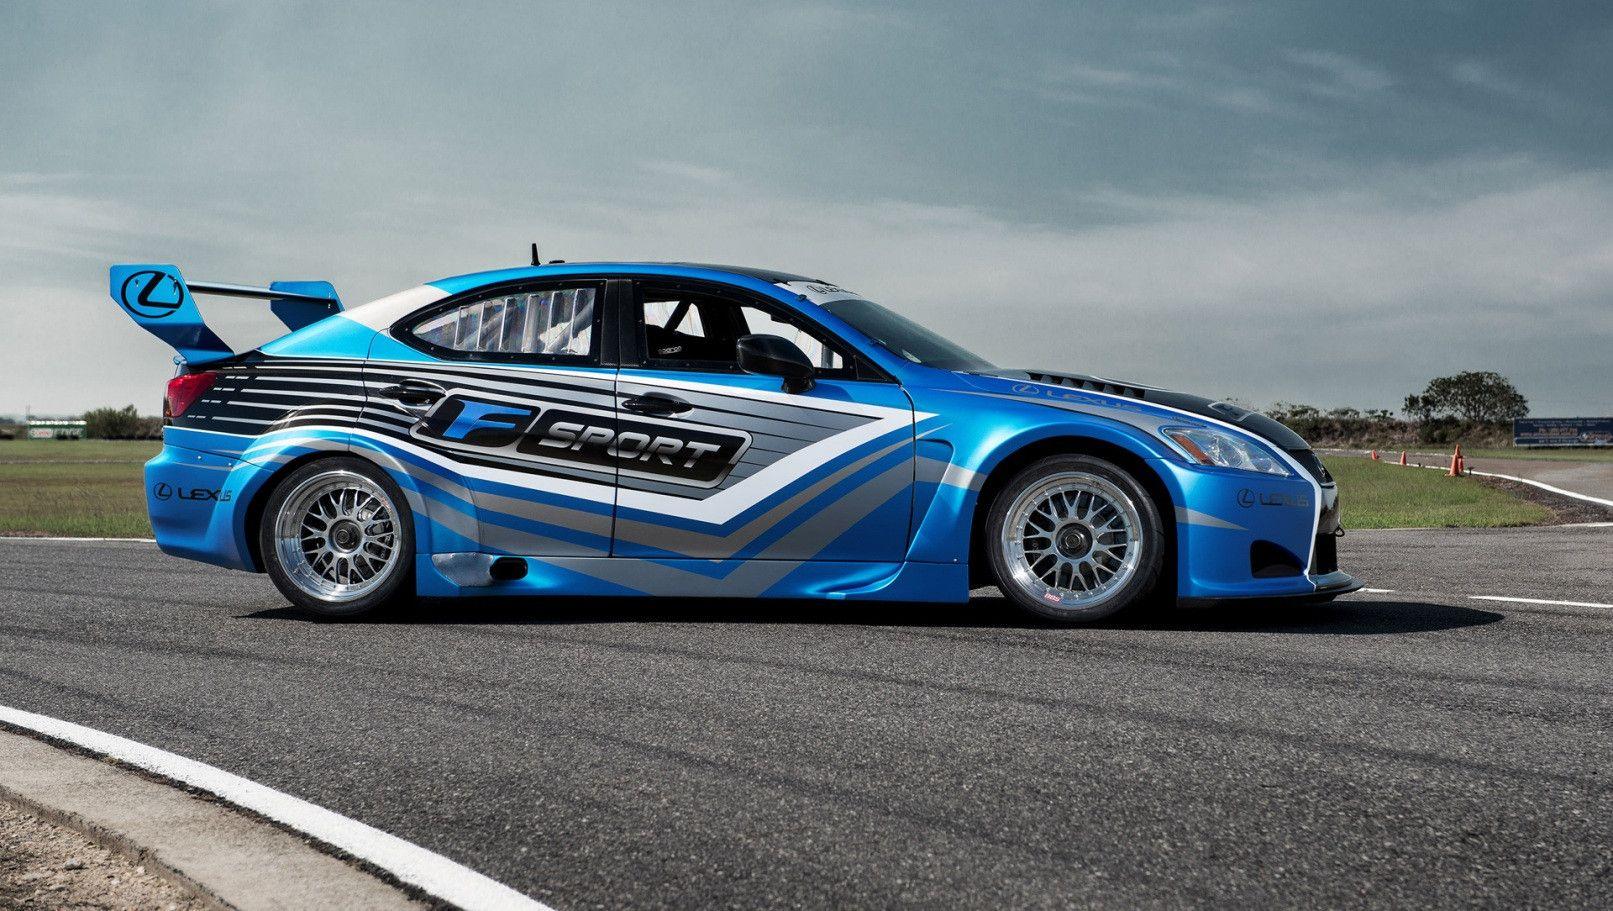 2013 Lexus V8 Supercar Wallpaper Download Wallpaper from 1613x911